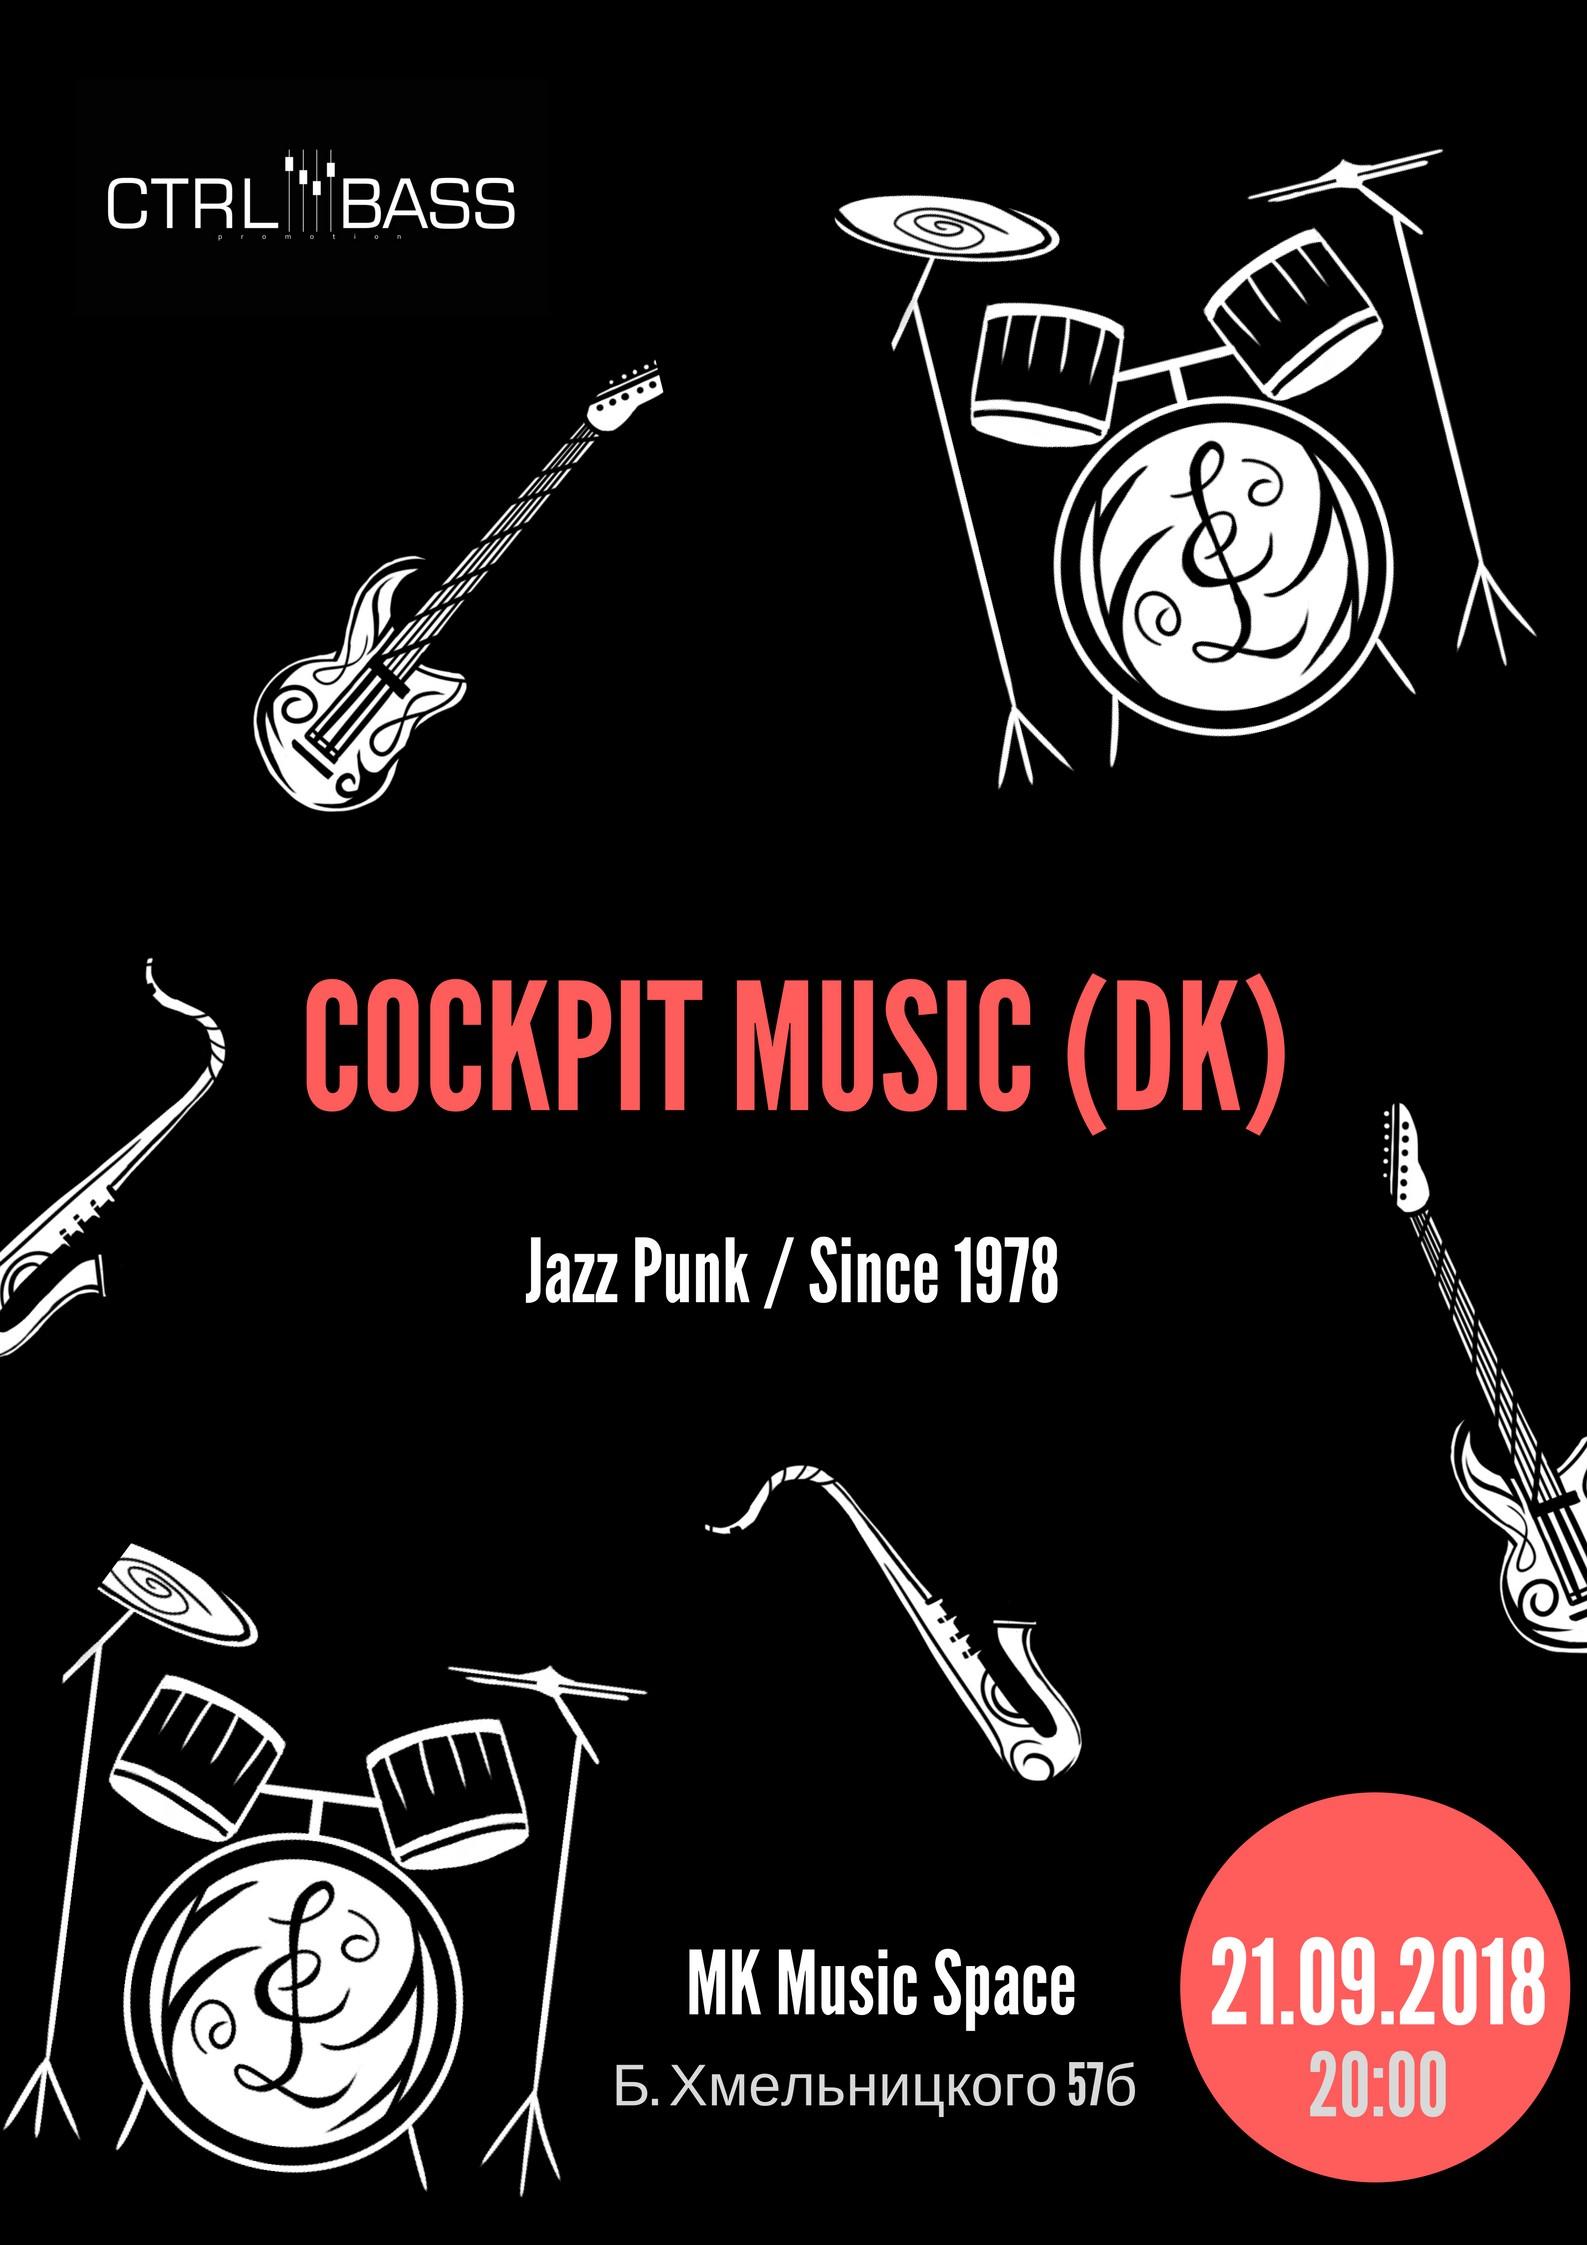 Билеты Cockpit Music (DK). Jazz punk at MK Music Space